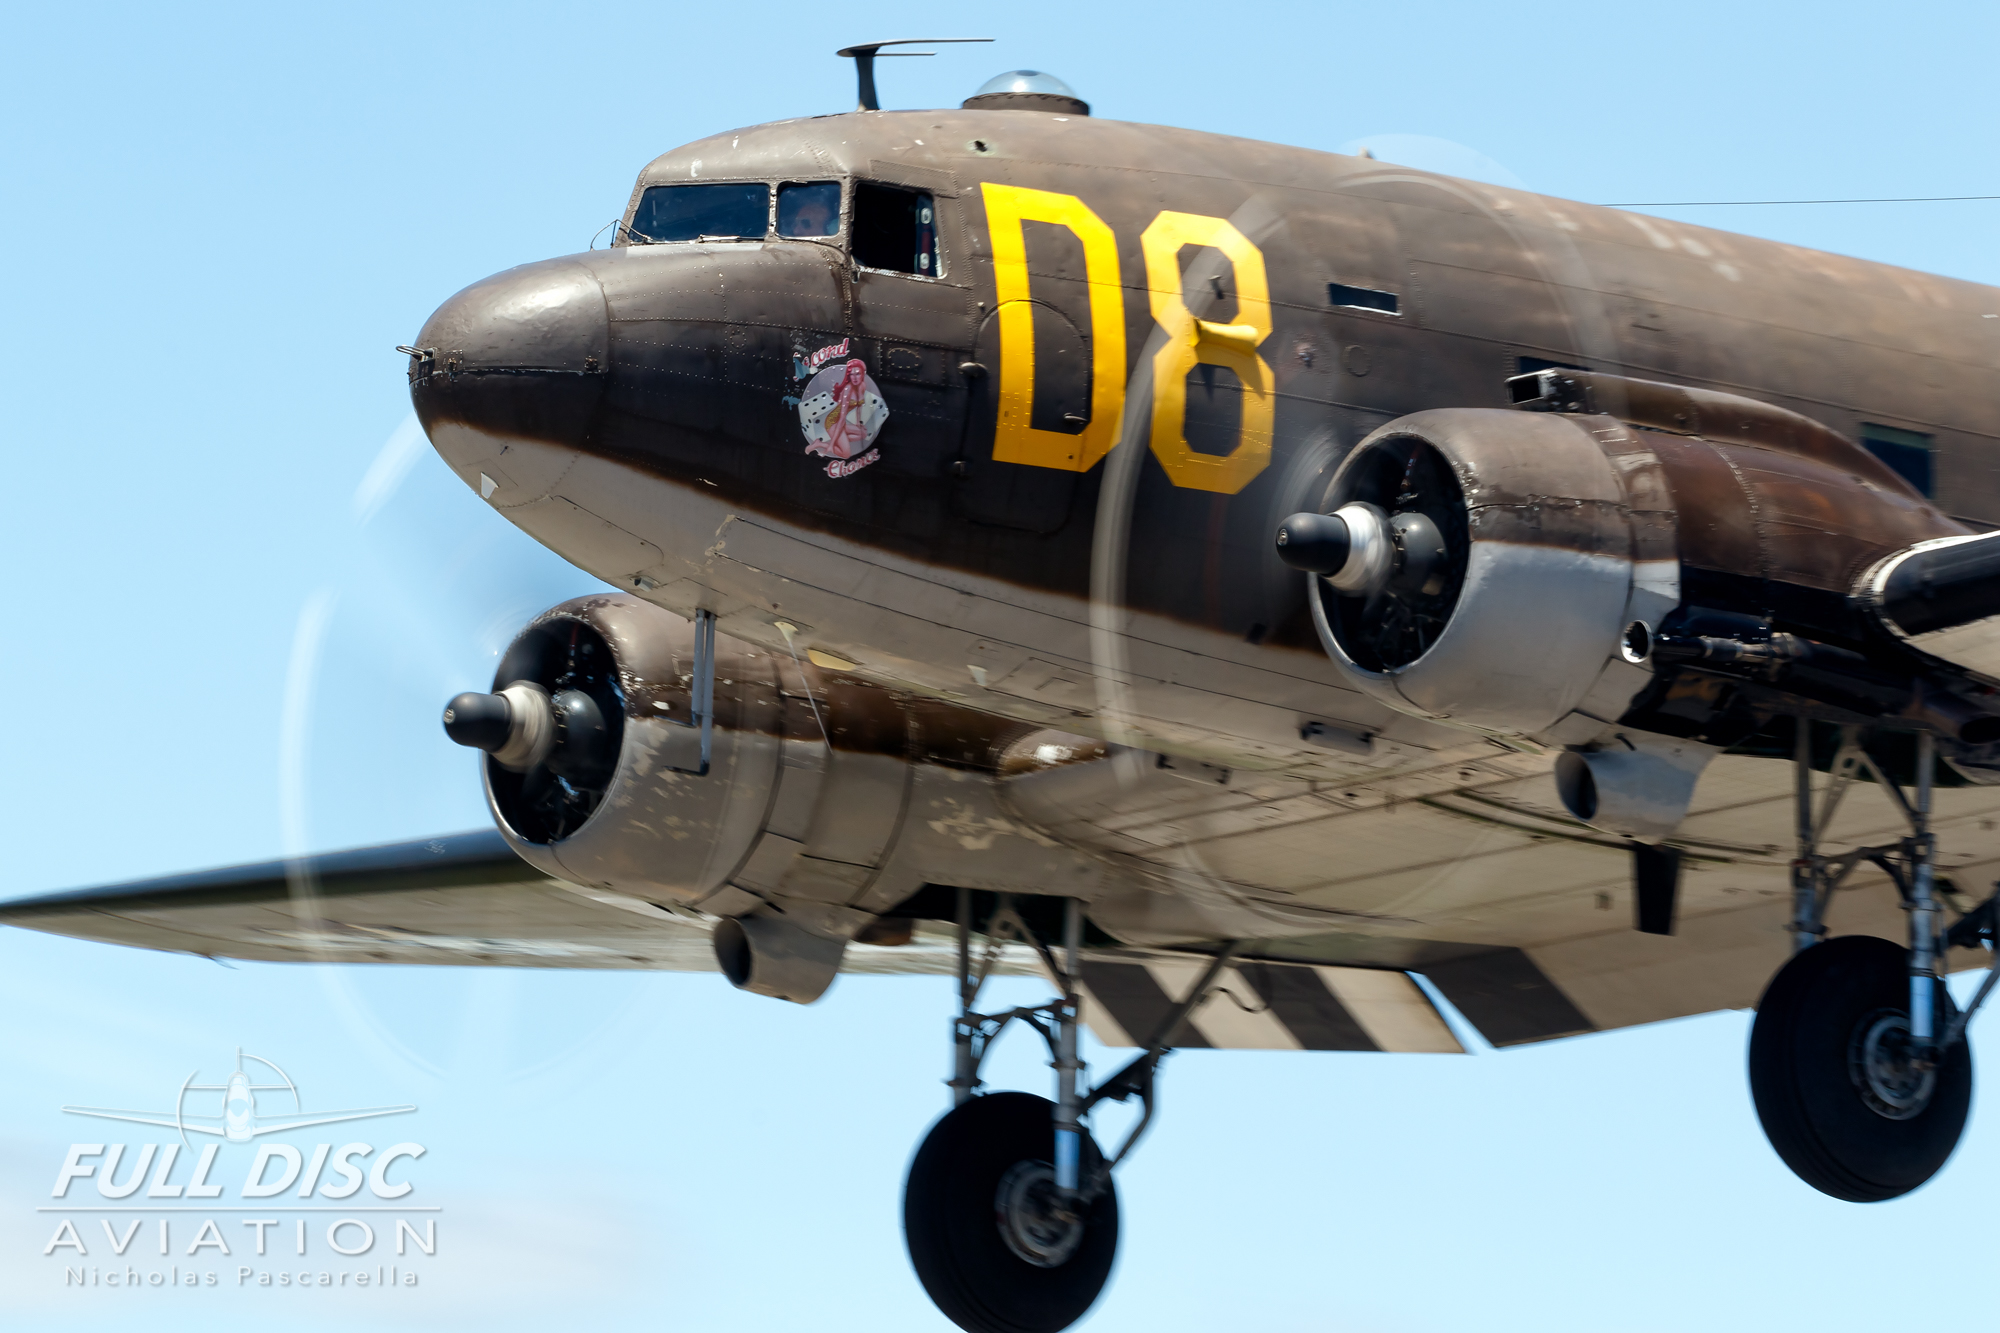 americanairpowermuseum_nicholaspascarella_nickpascarella_fulldiscaviation_legendsofairpower2019_aviation_warbird_c47_gooneybird_landing.jpg